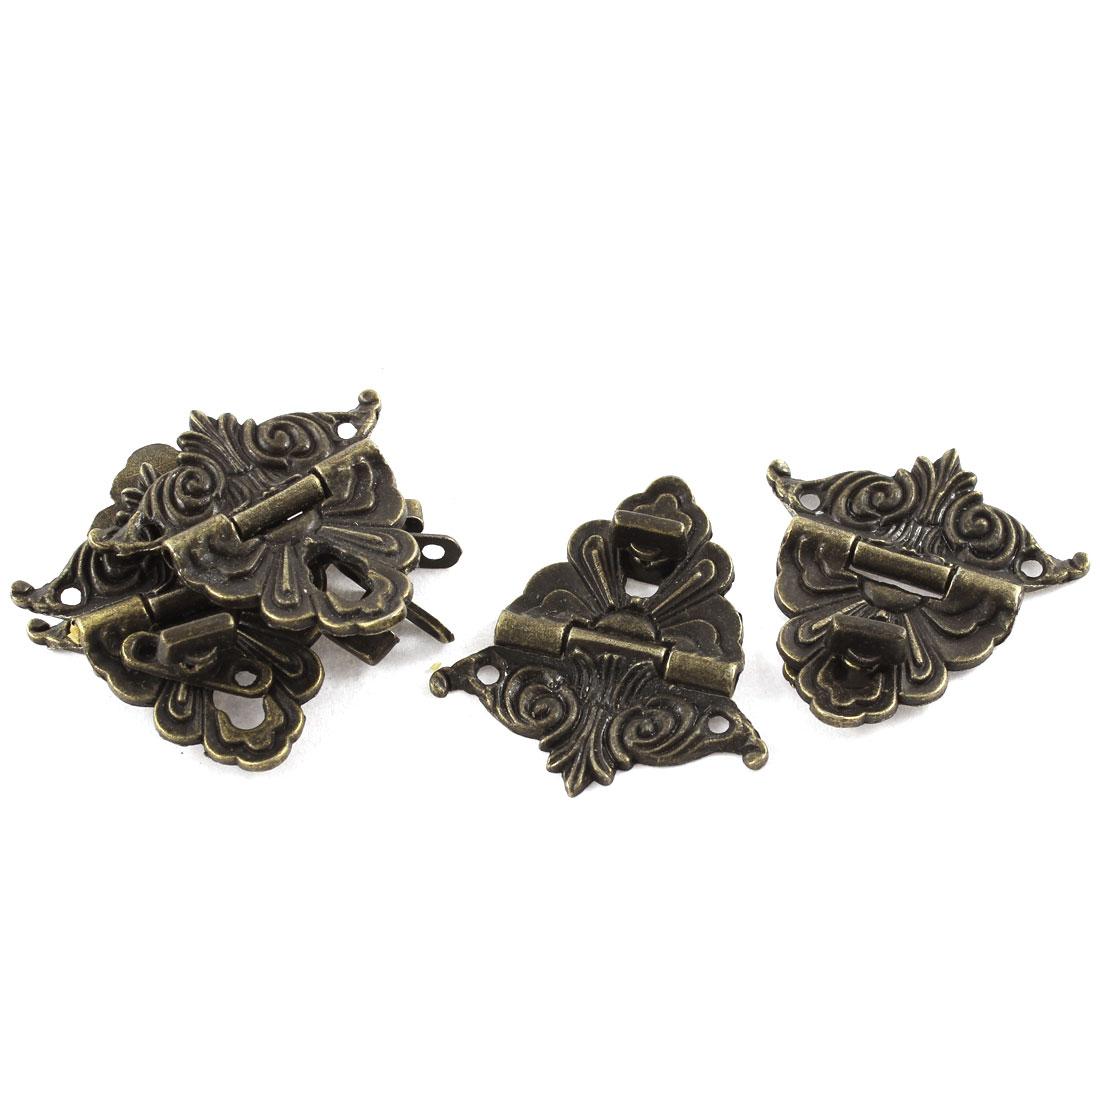 5pcs 48mmx45mm Retro Style Bronze Tone Jewelry Box Drawer Decorative Hasp Lock Latch